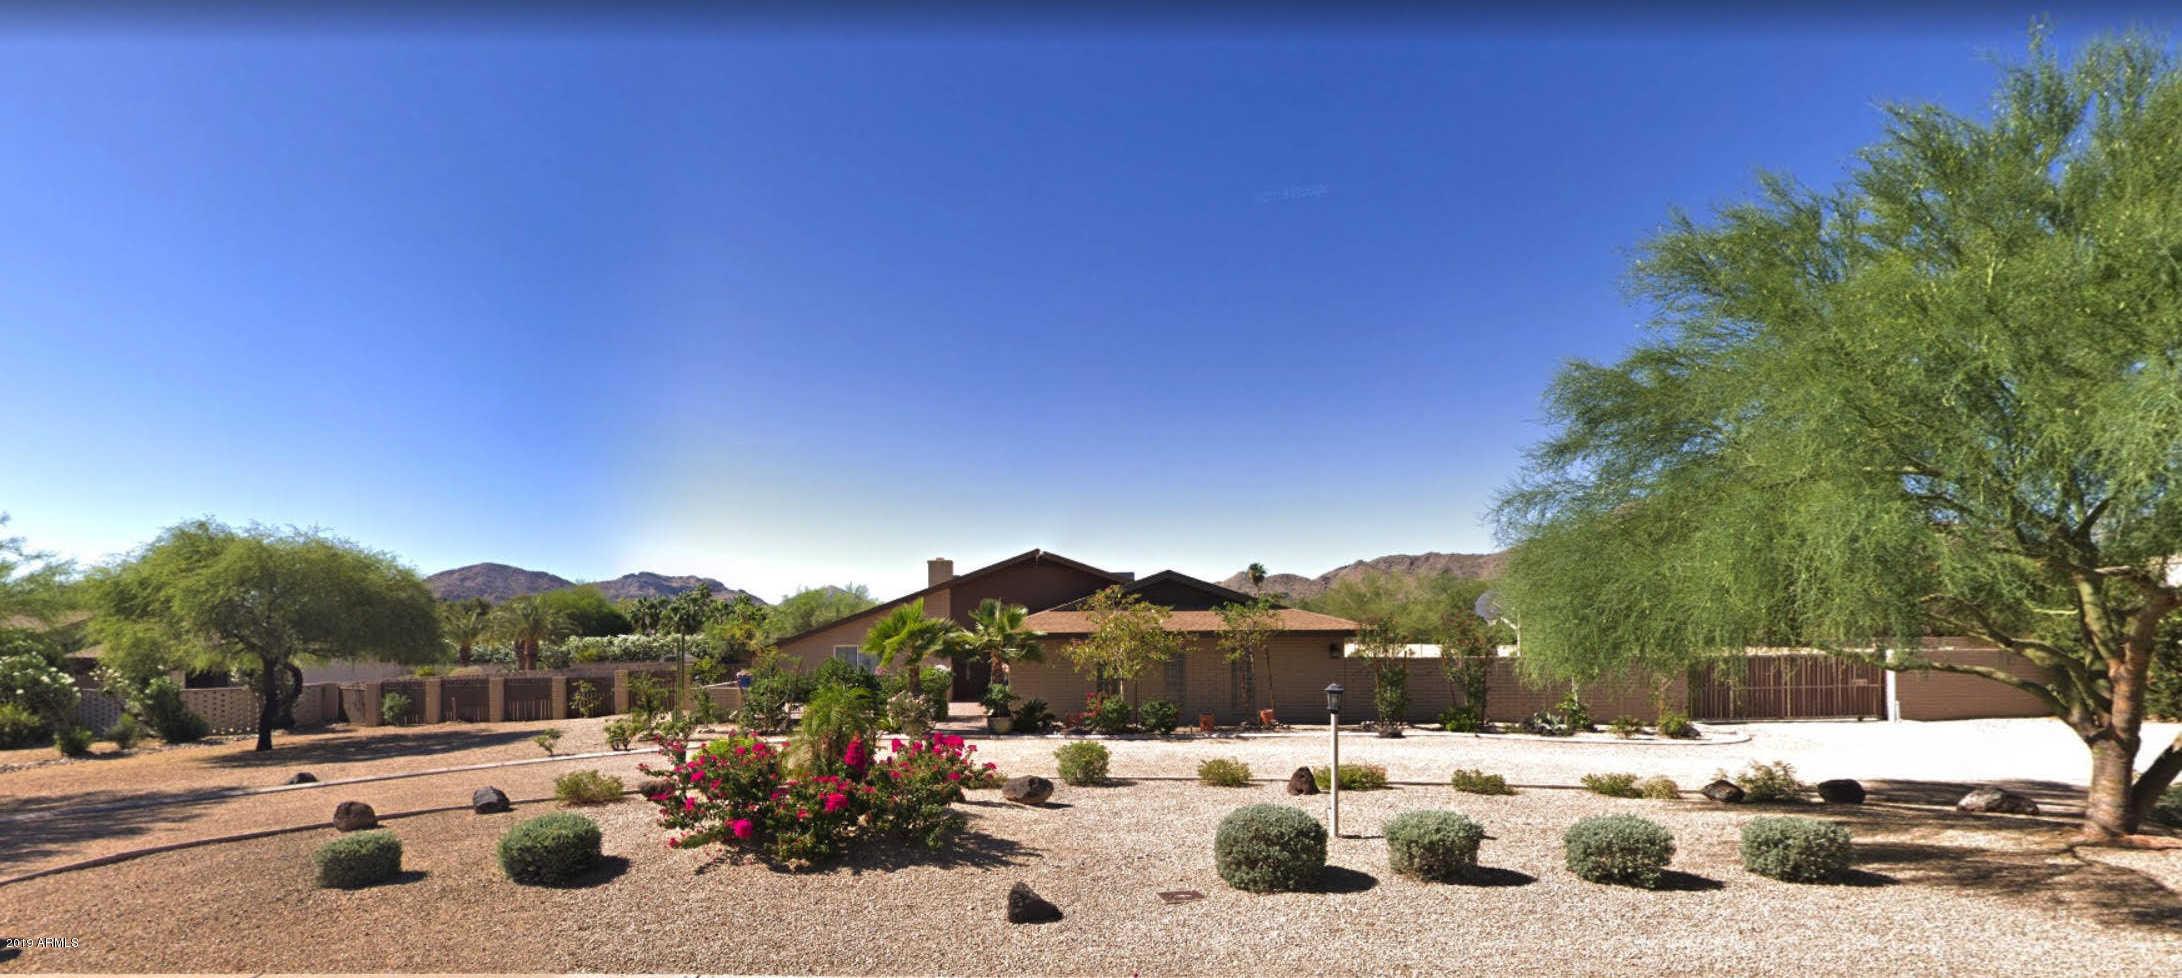 $1,040,000 - 4Br/3Ba - Home for Sale in Tatum Garden Estates, Paradise Valley